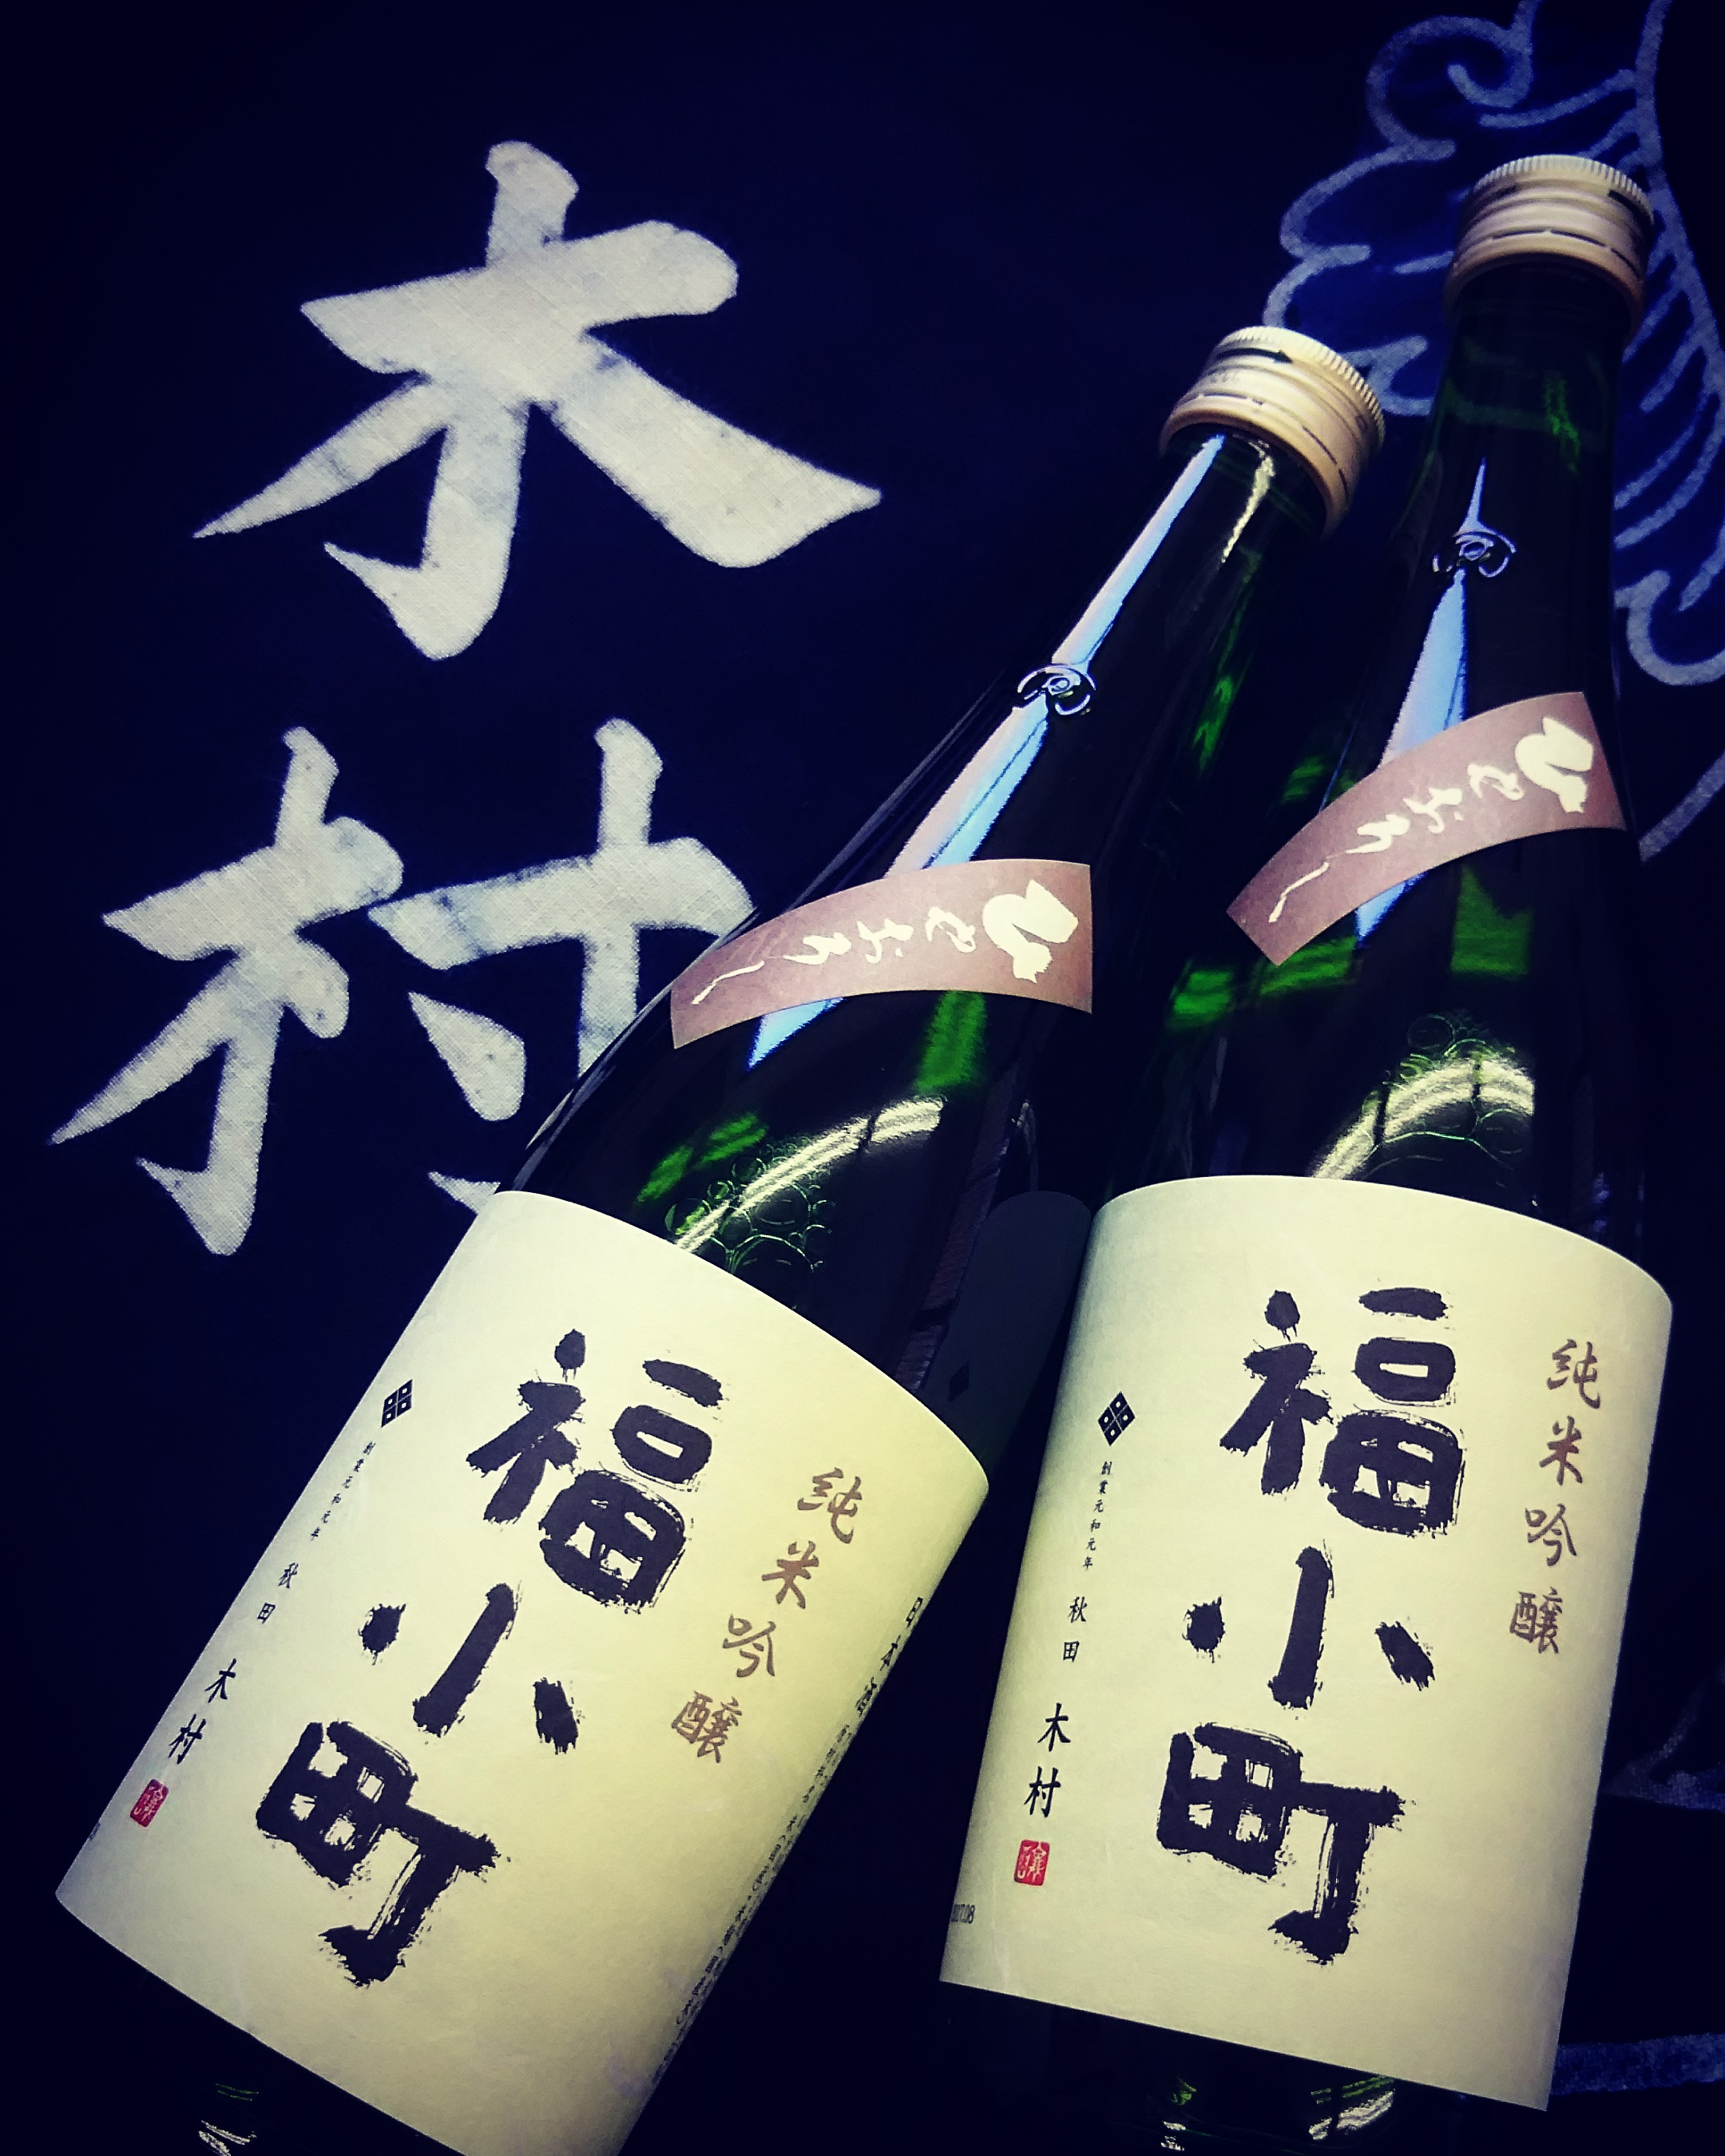 http://www.fukukomachi.com/blog/photo/IMG_20170901_102004_658.jpg